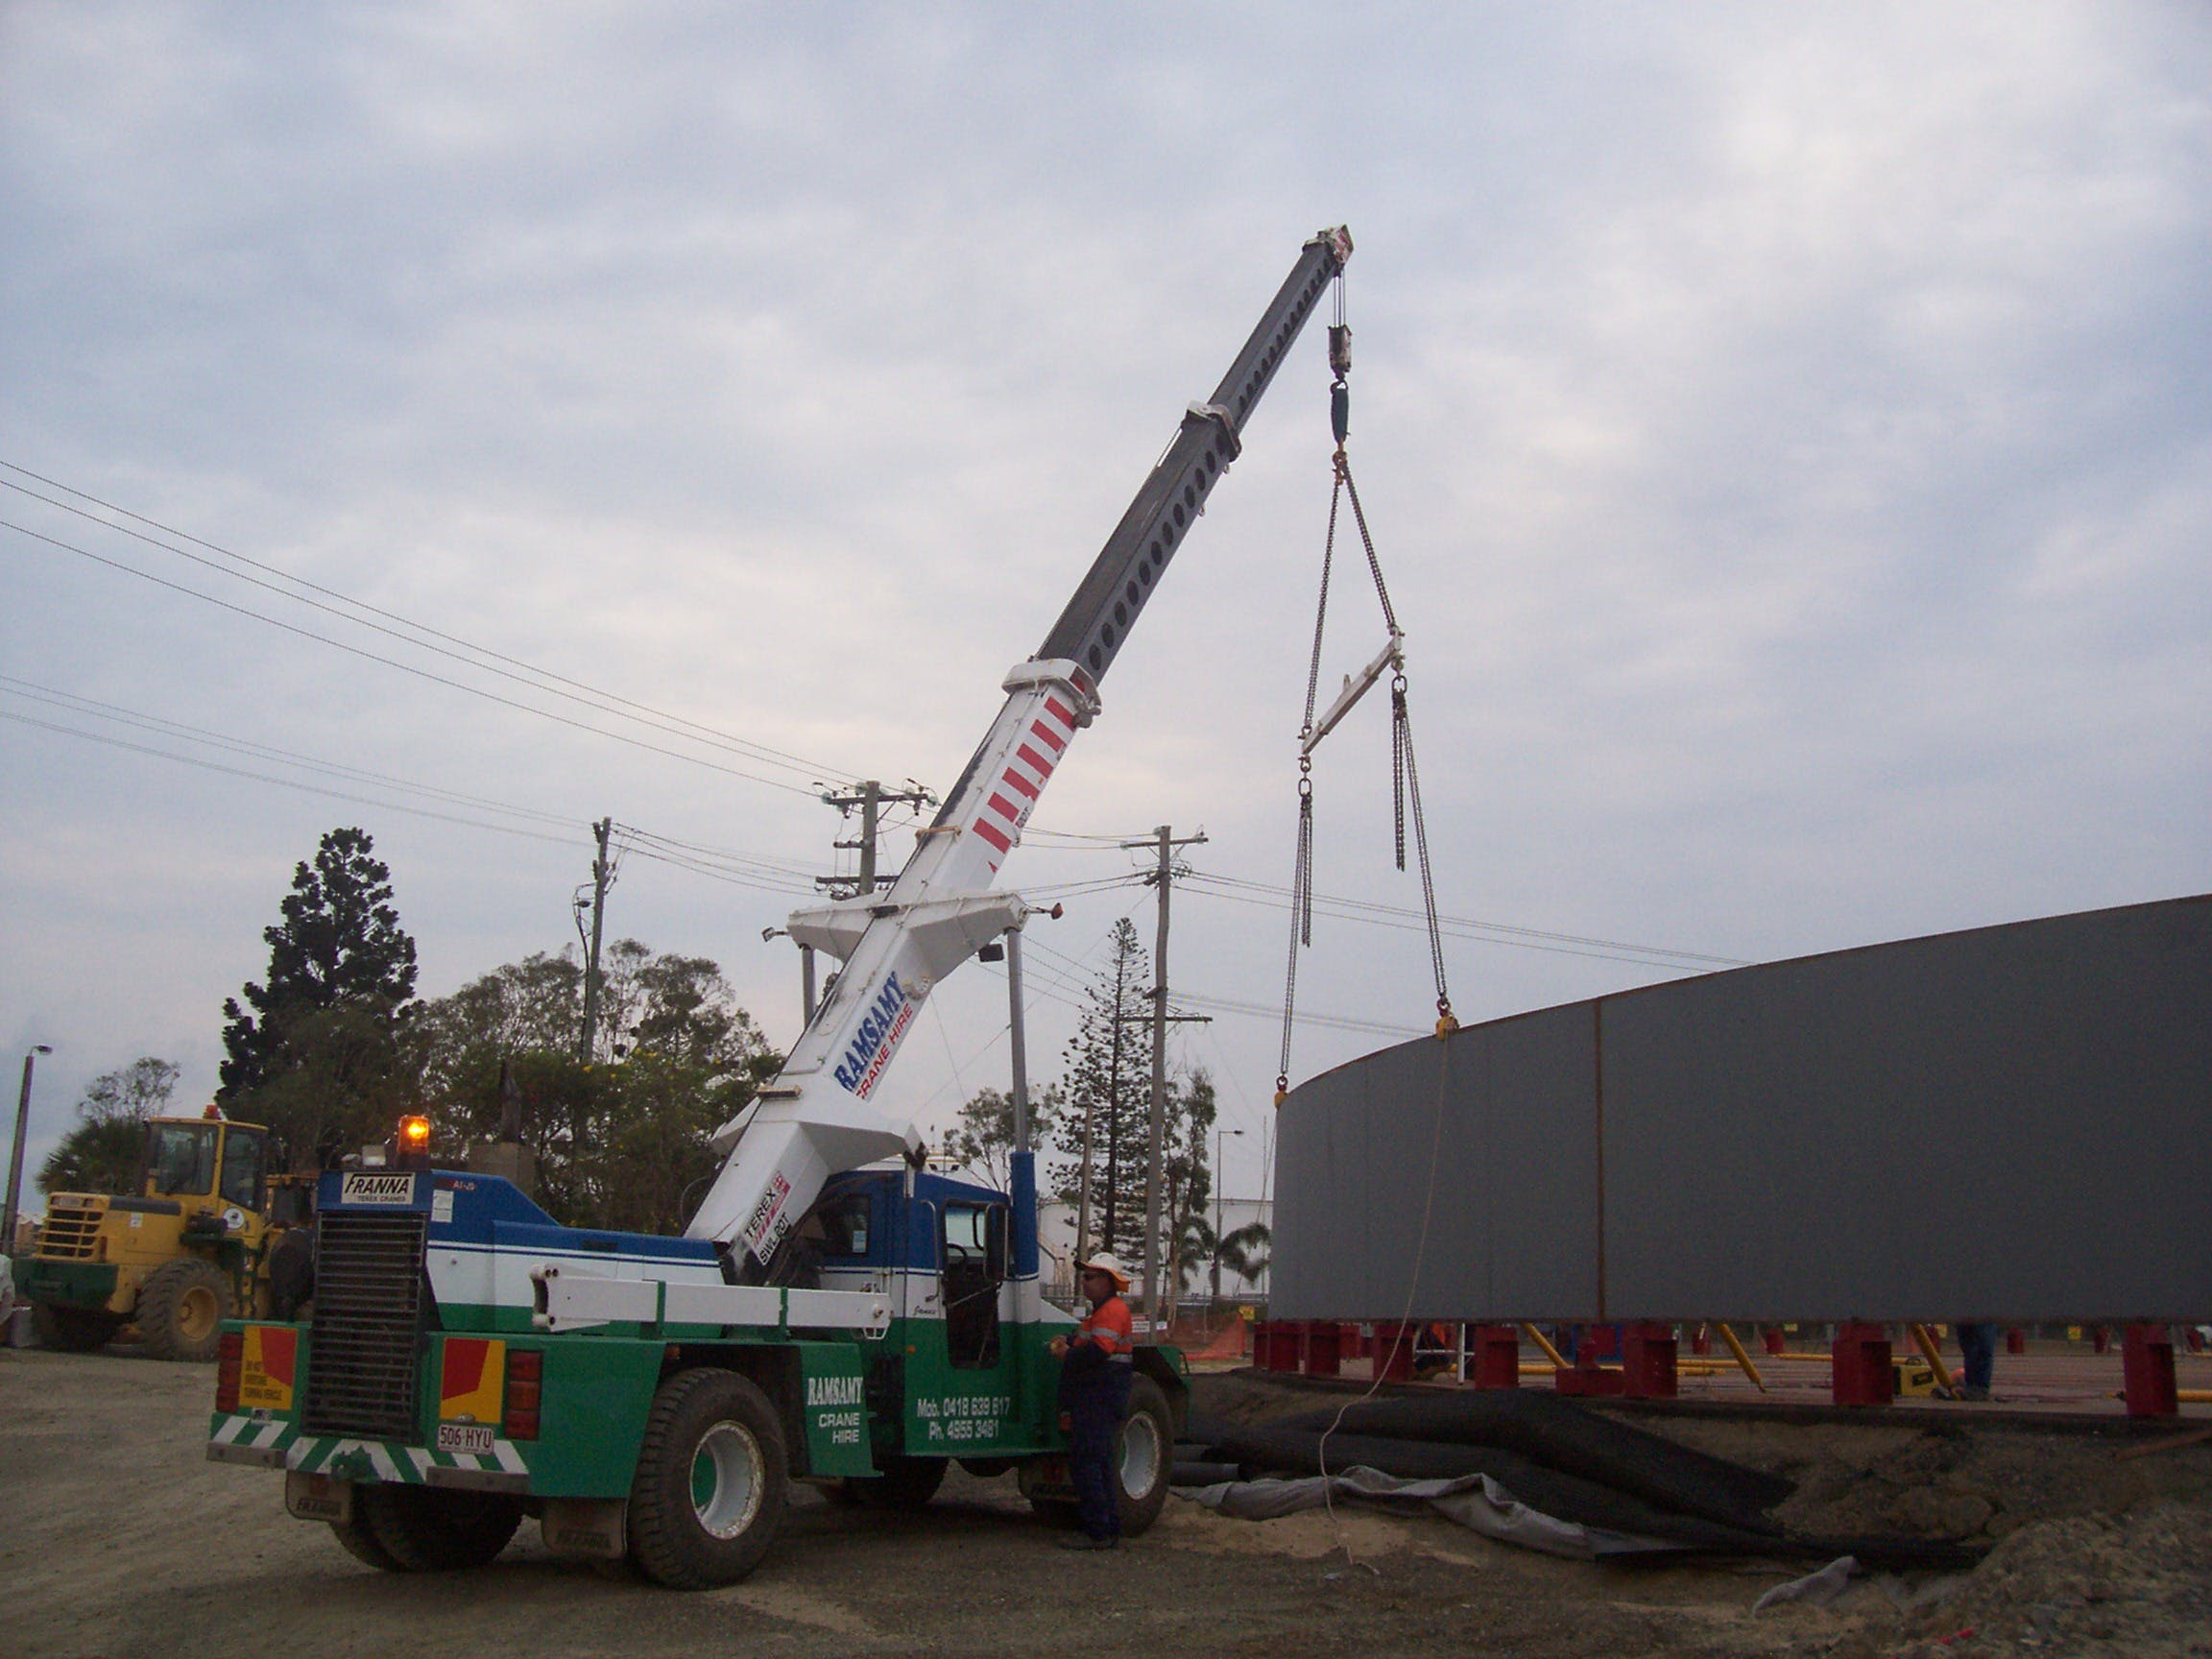 LA & LR Ramsamy Crane Hire Pty Ltd